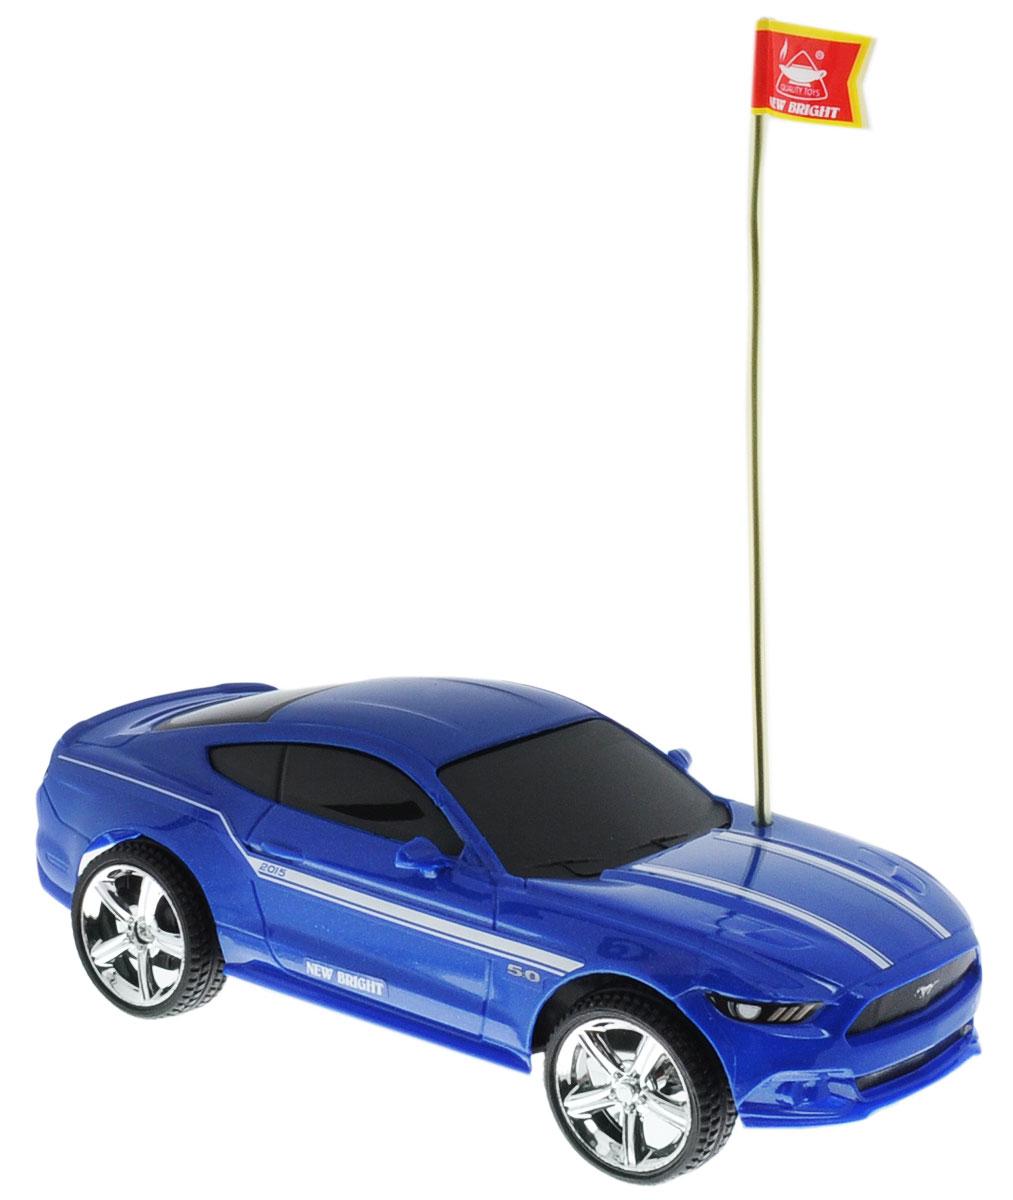 New Bright Радиоуправляемая модель Ford Mustang GT 2015 new bright new bright радиоуправляемые машинки challenger hellcat на р у